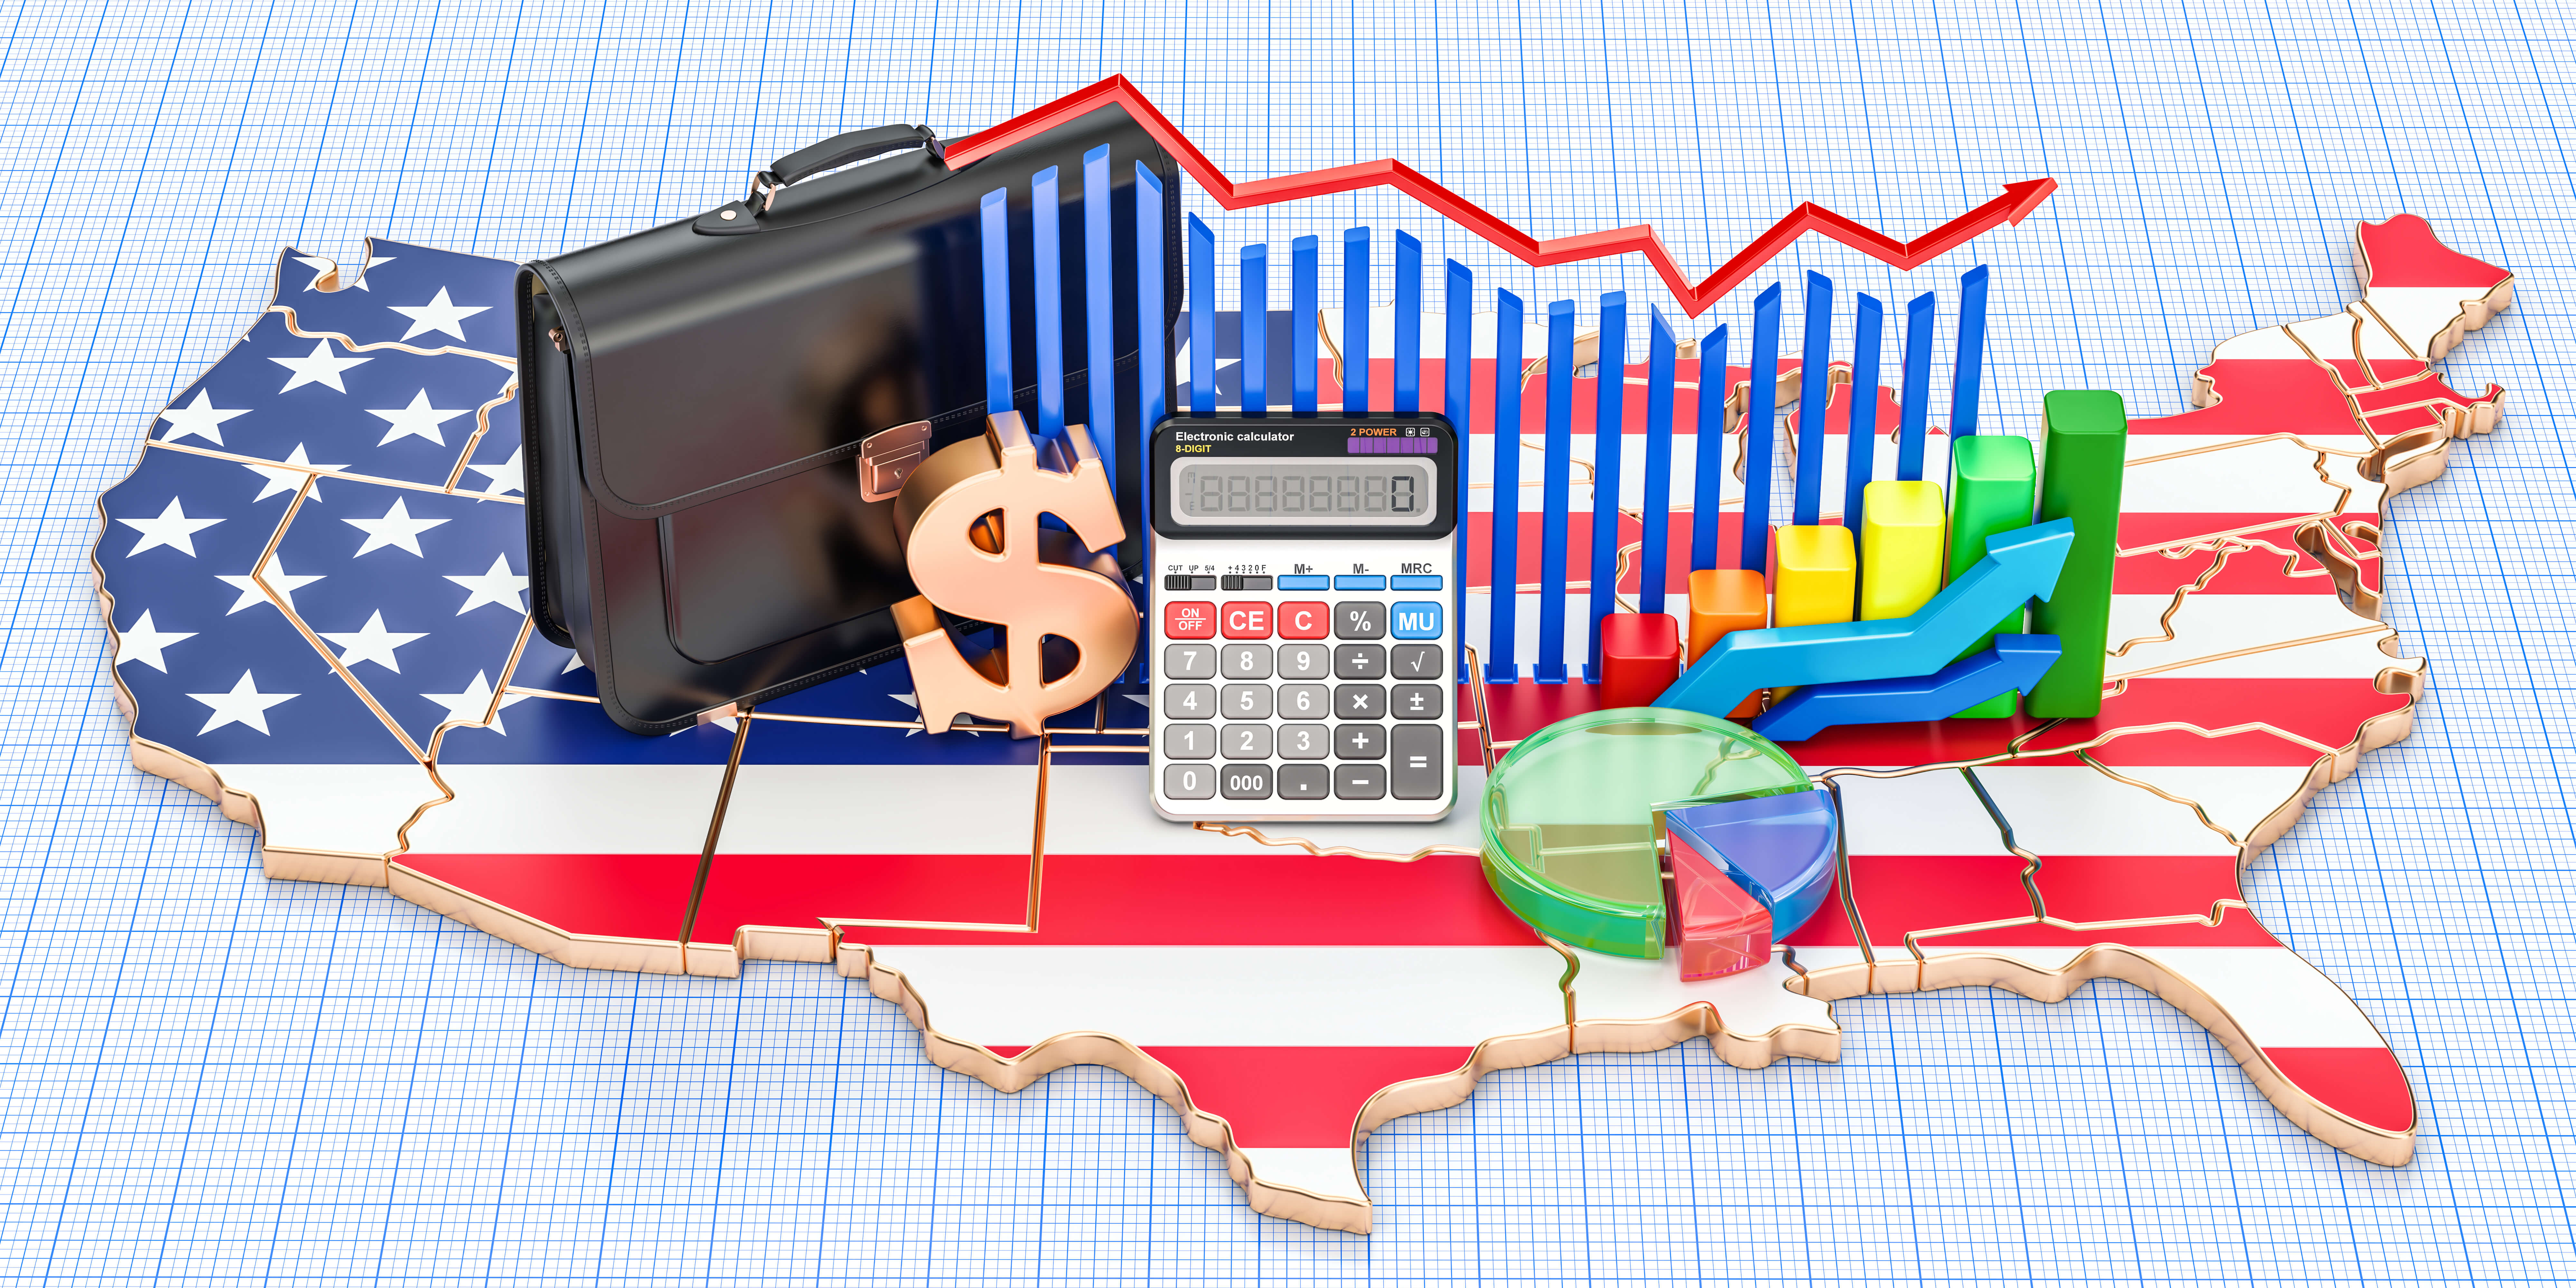 June job report and U.S. economy